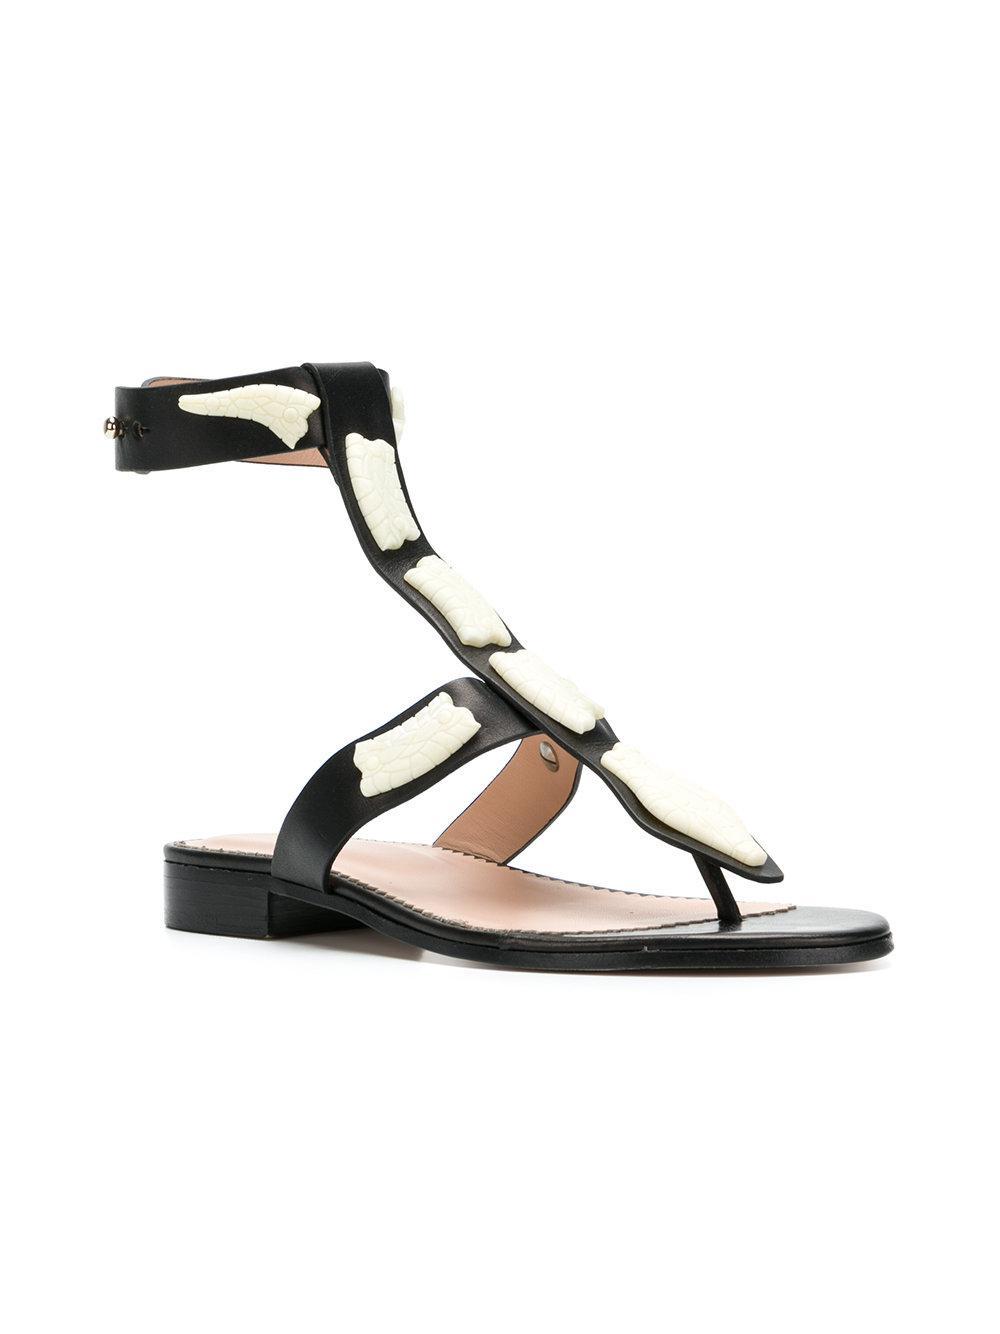 8c4a257de Lyst - RED Valentino Sin Flat Sandals in Black